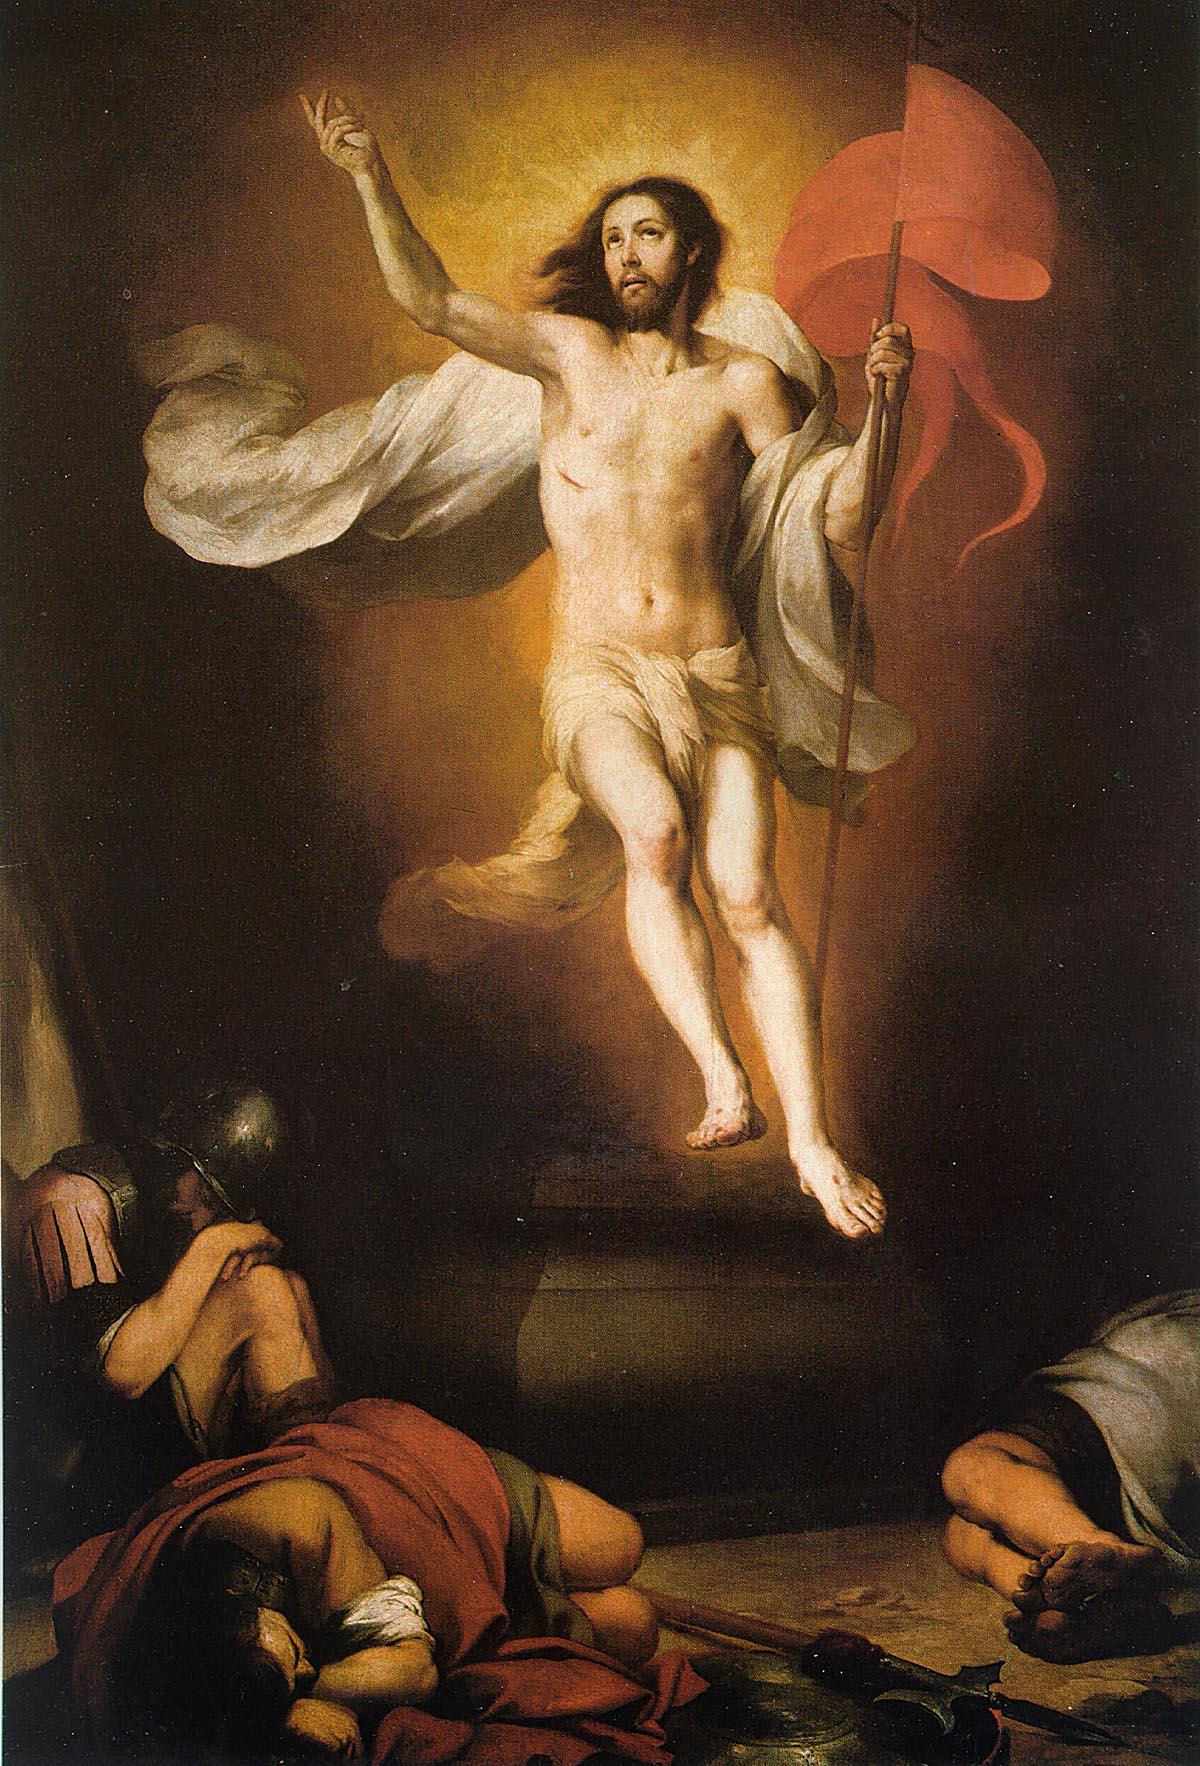 Resurrection of Christ – Bartolomé Esteban Murillo